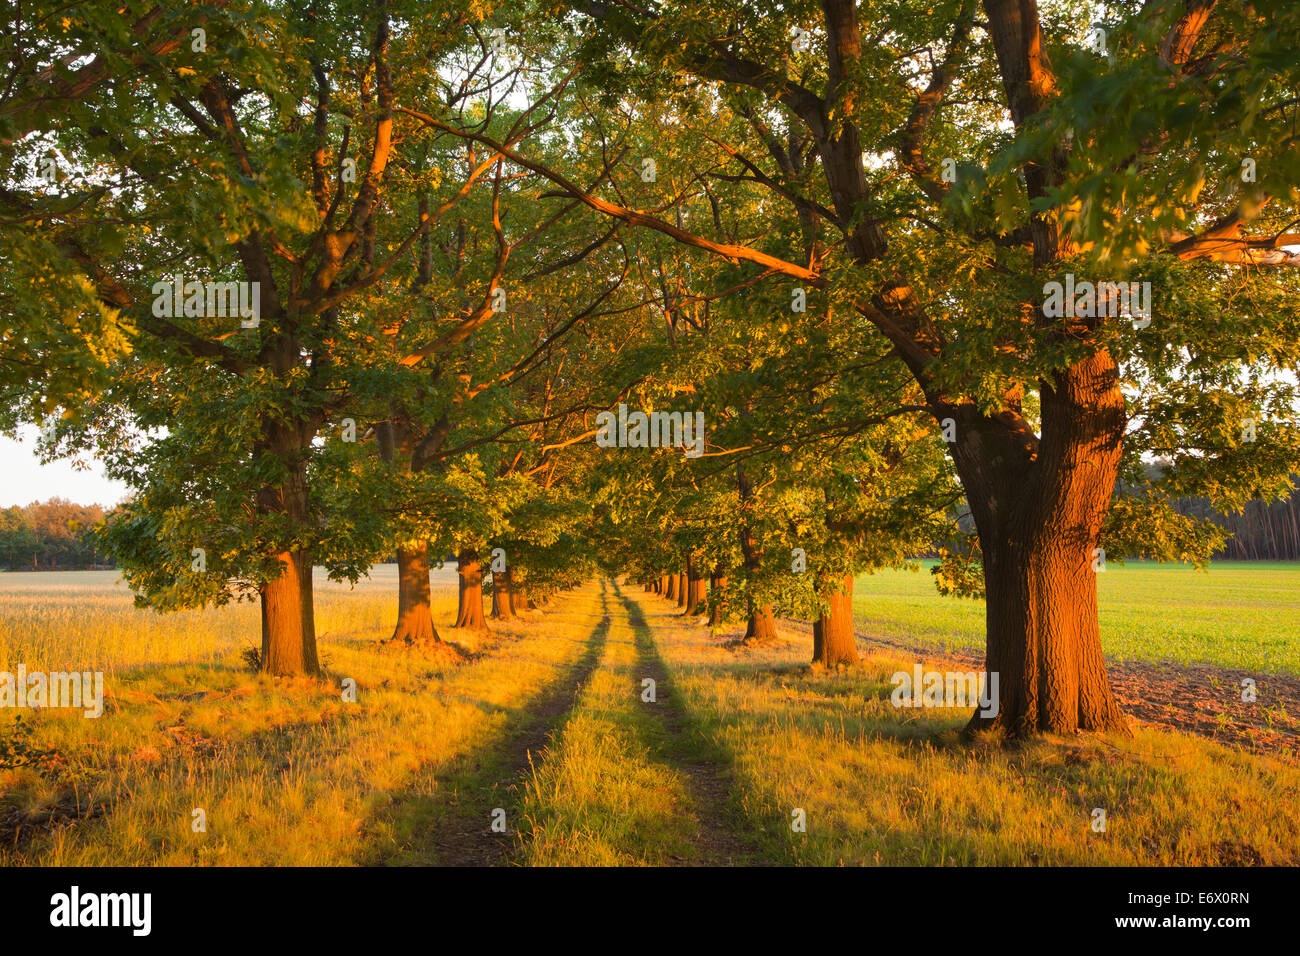 Alley of red oaks, Niederlausitz, Brandenburg, Germany Stock Photo